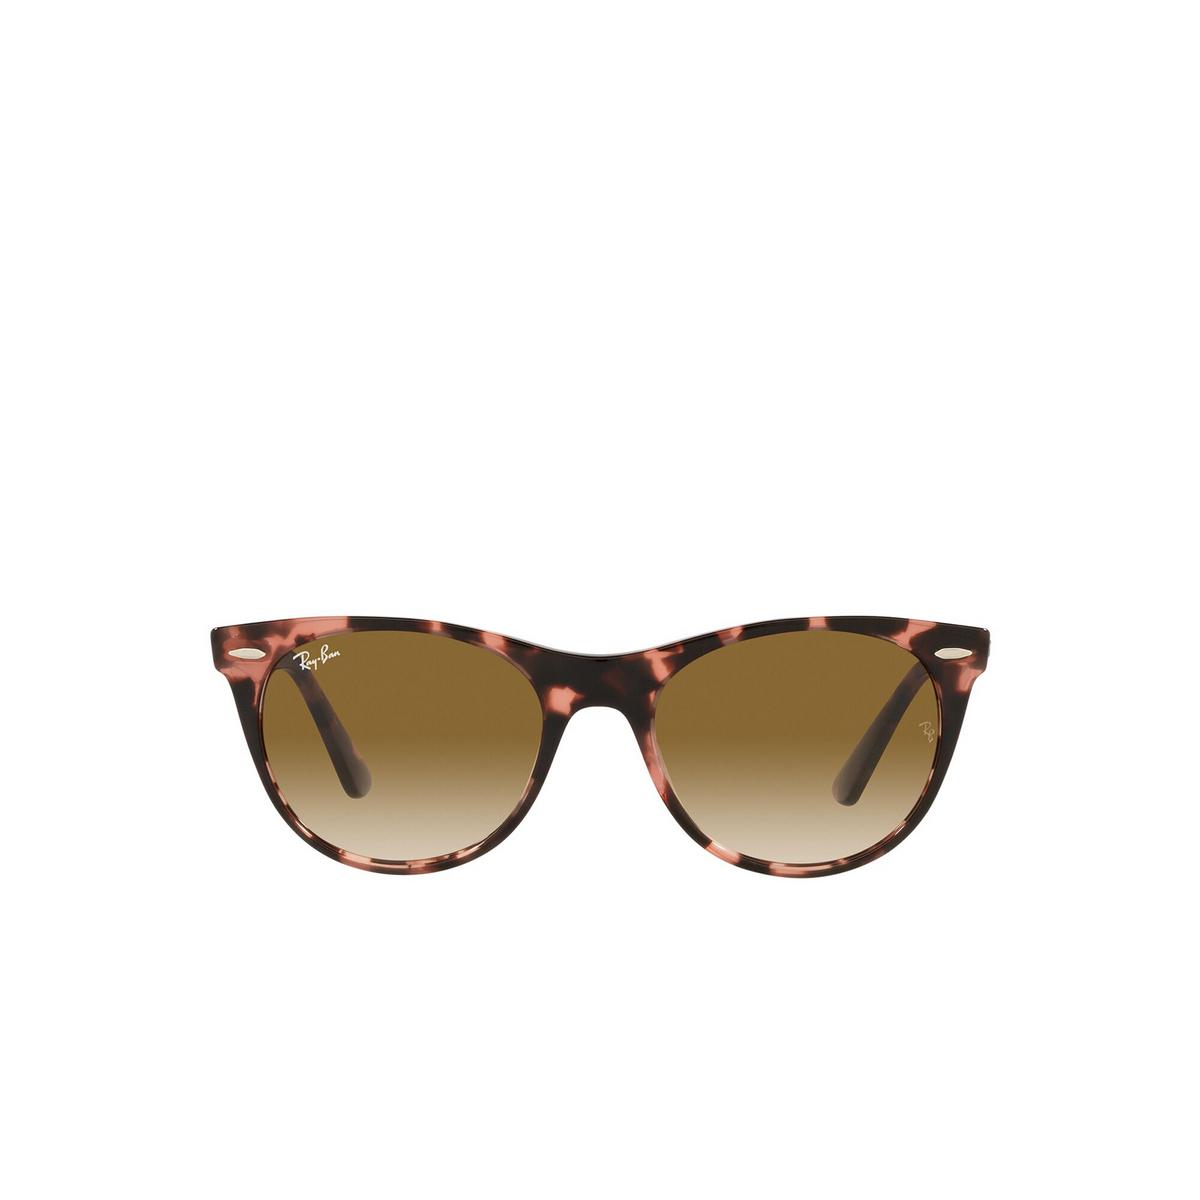 Ray-Ban® Round Sunglasses: Wayfarer Ii RB2185 color Pink Havana 133451 - front view.